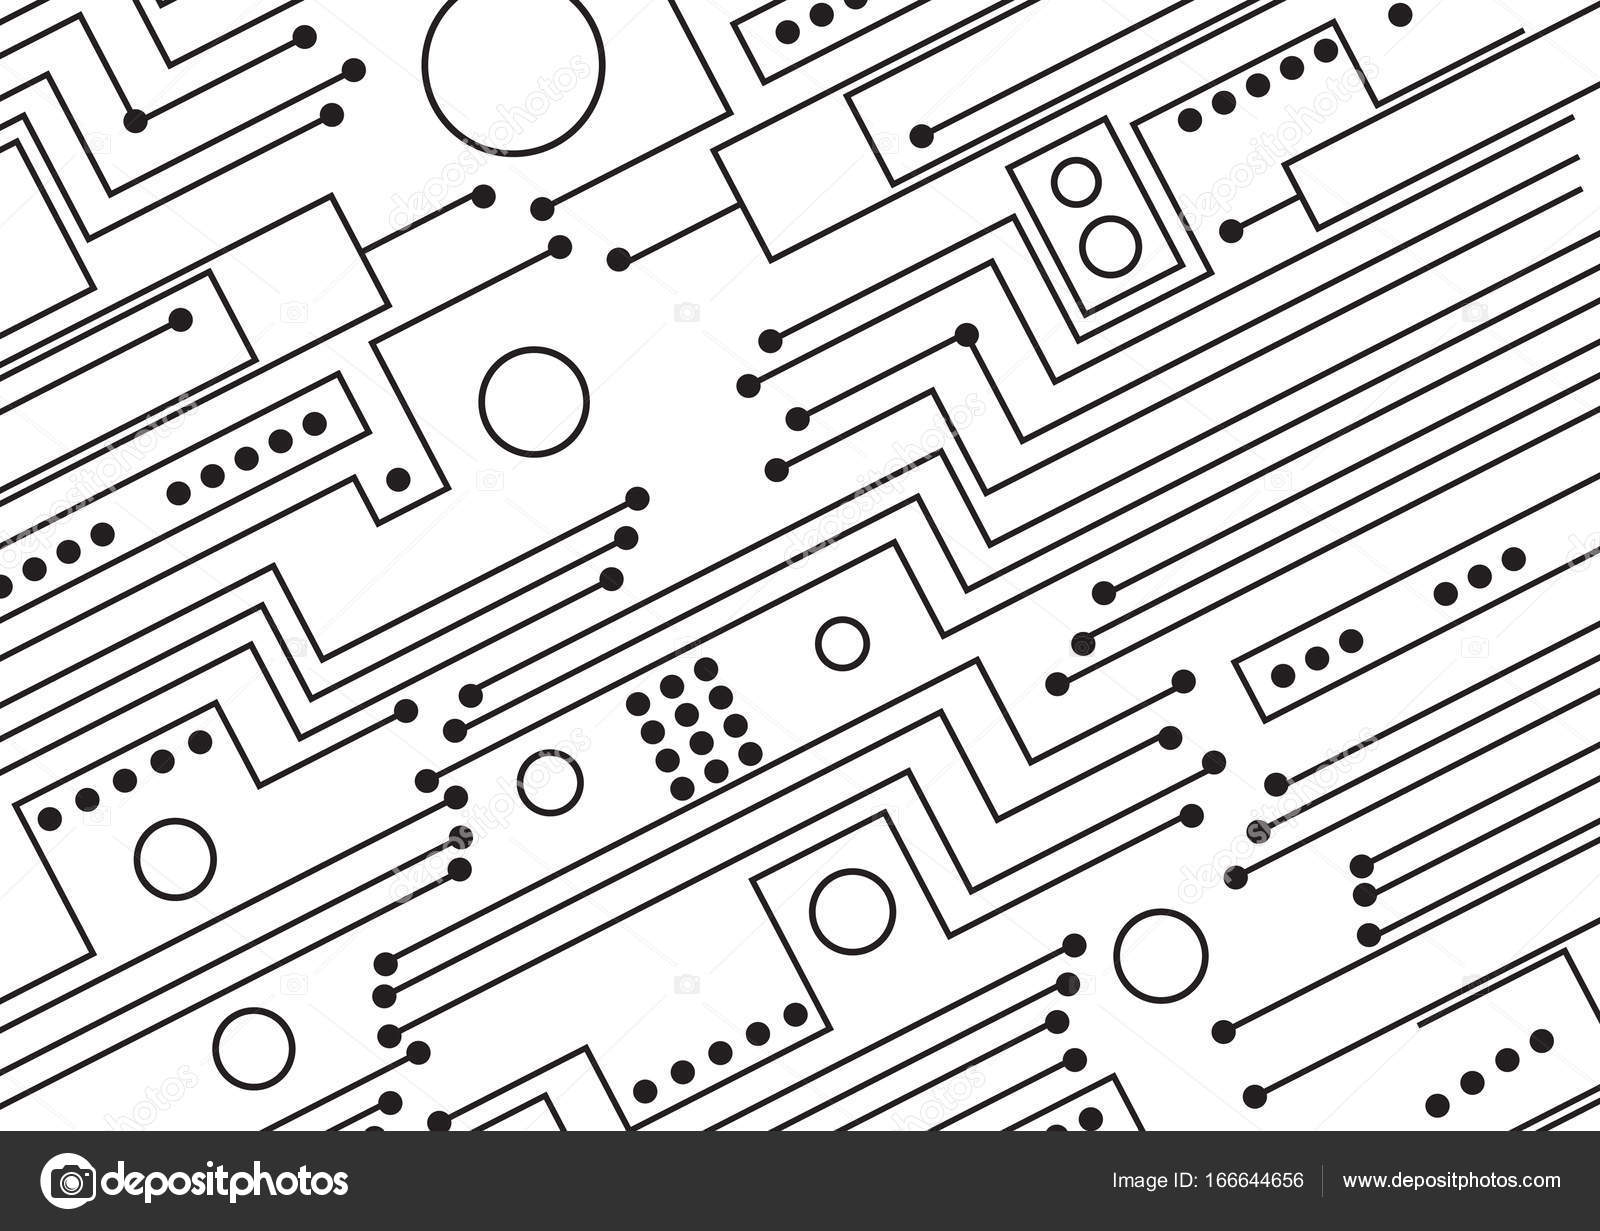 Computer Circuit board illustration — Stock Photo